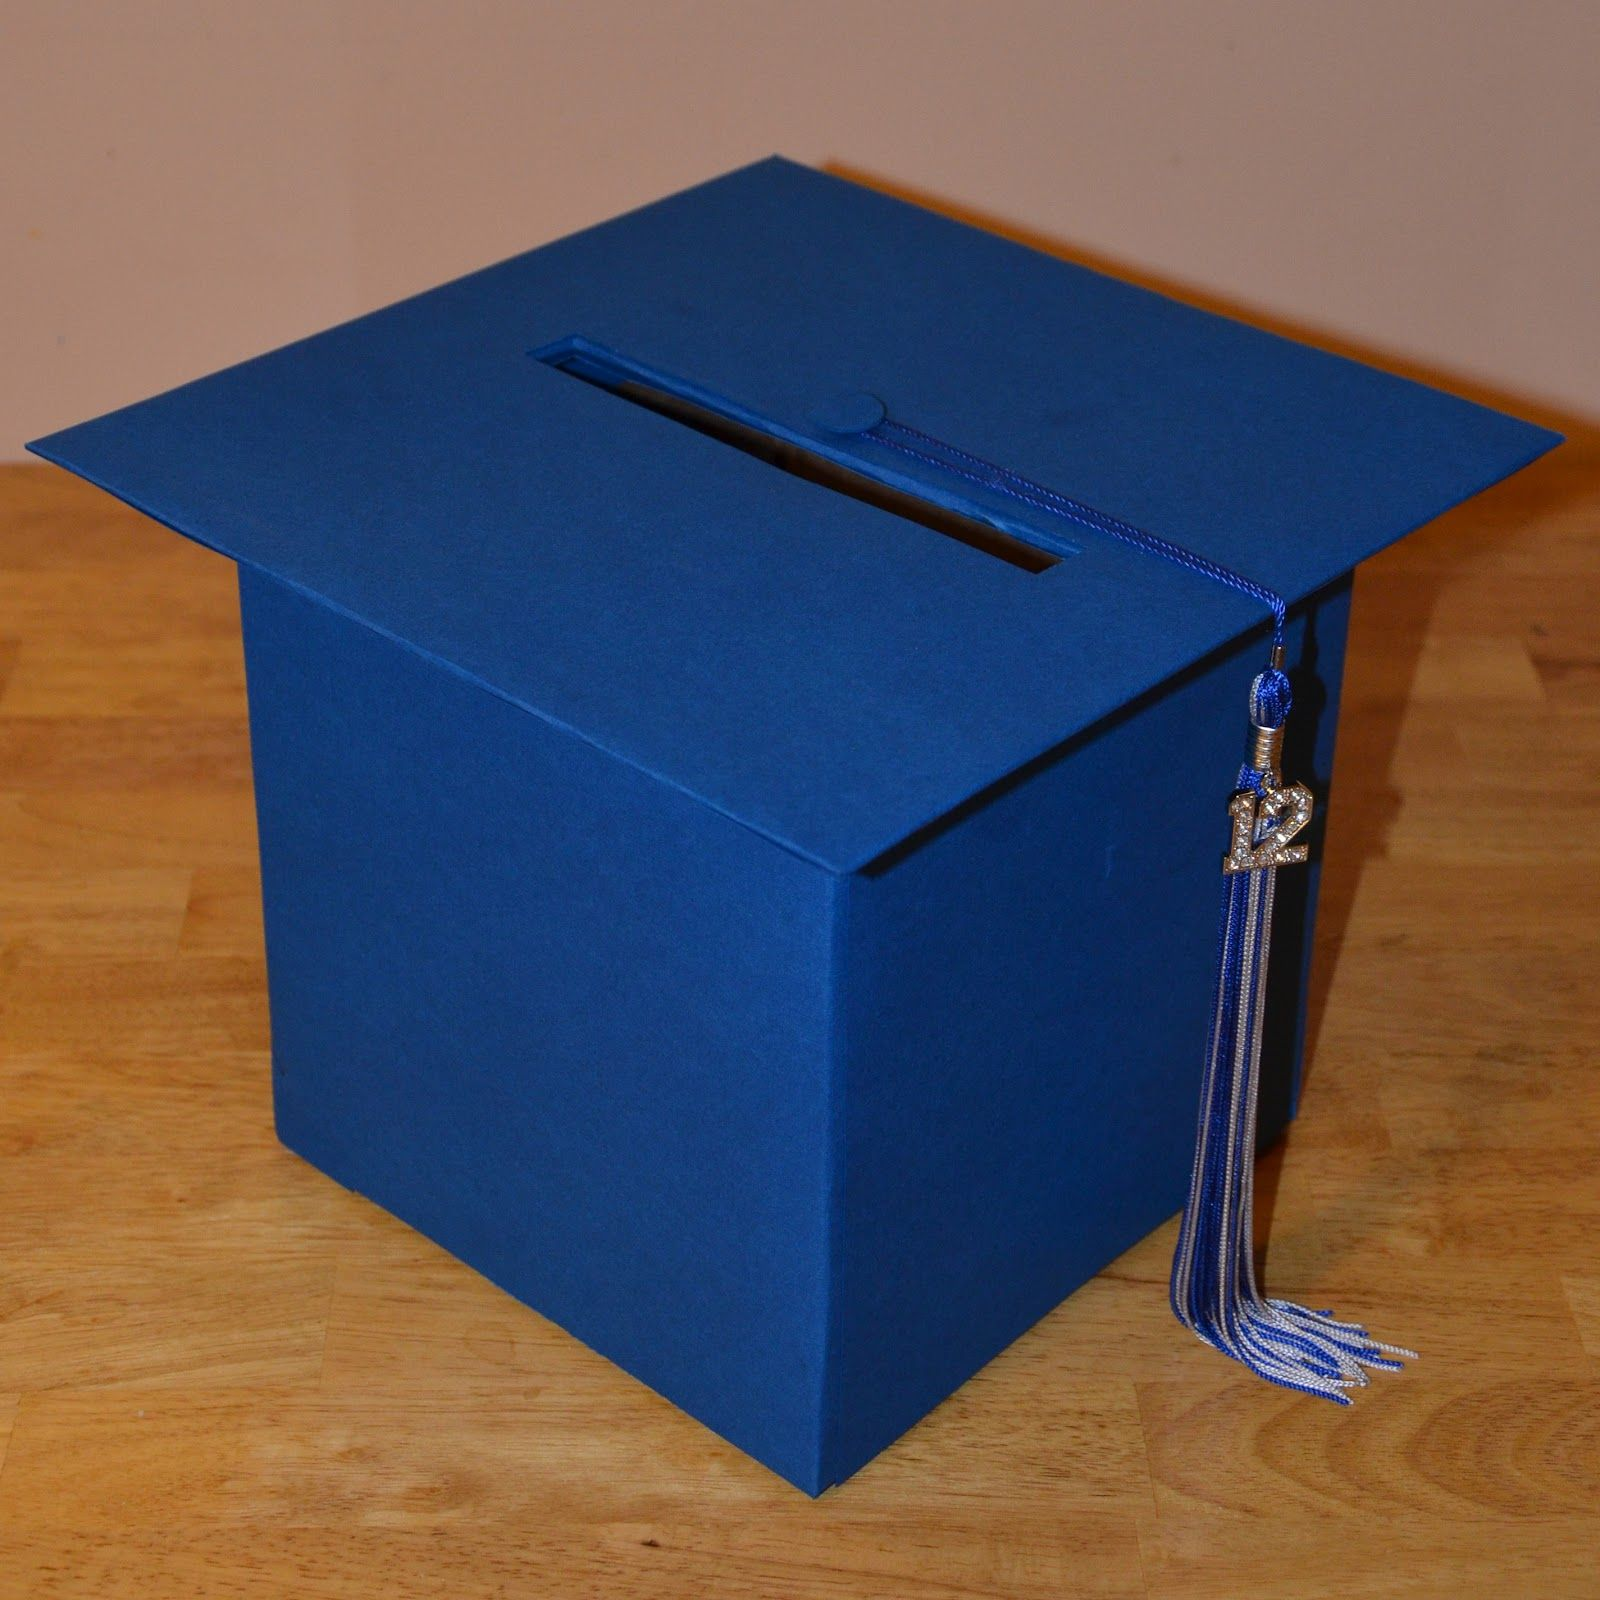 Nancys craft spot graduation card box diy crafts gift ideas nancys craft spot graduation card box solutioingenieria Choice Image